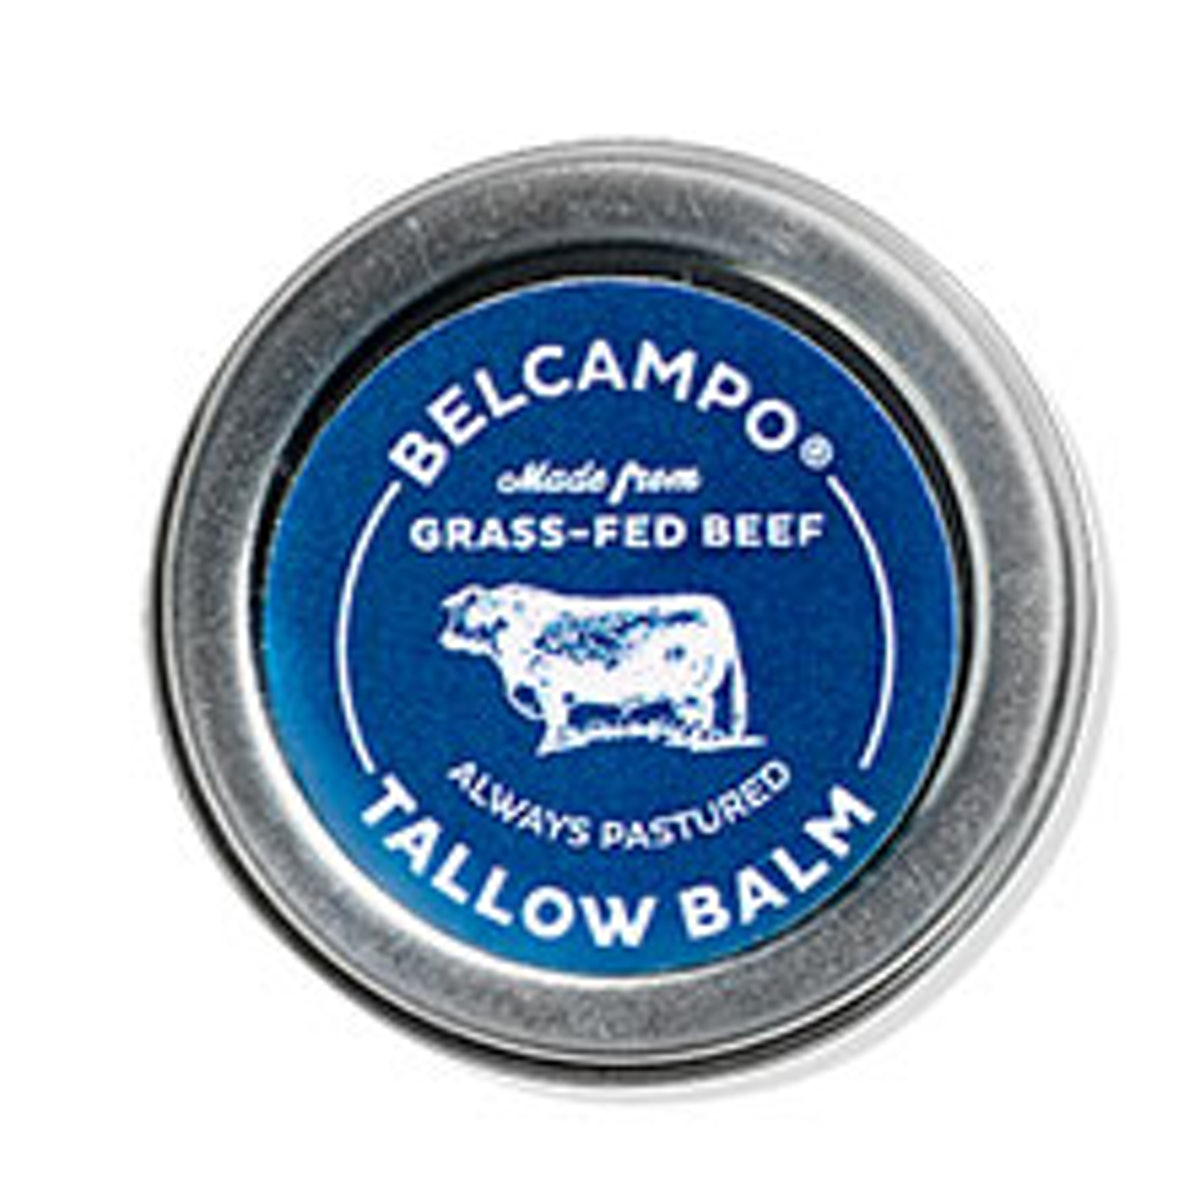 Belcampo Tallow Balm